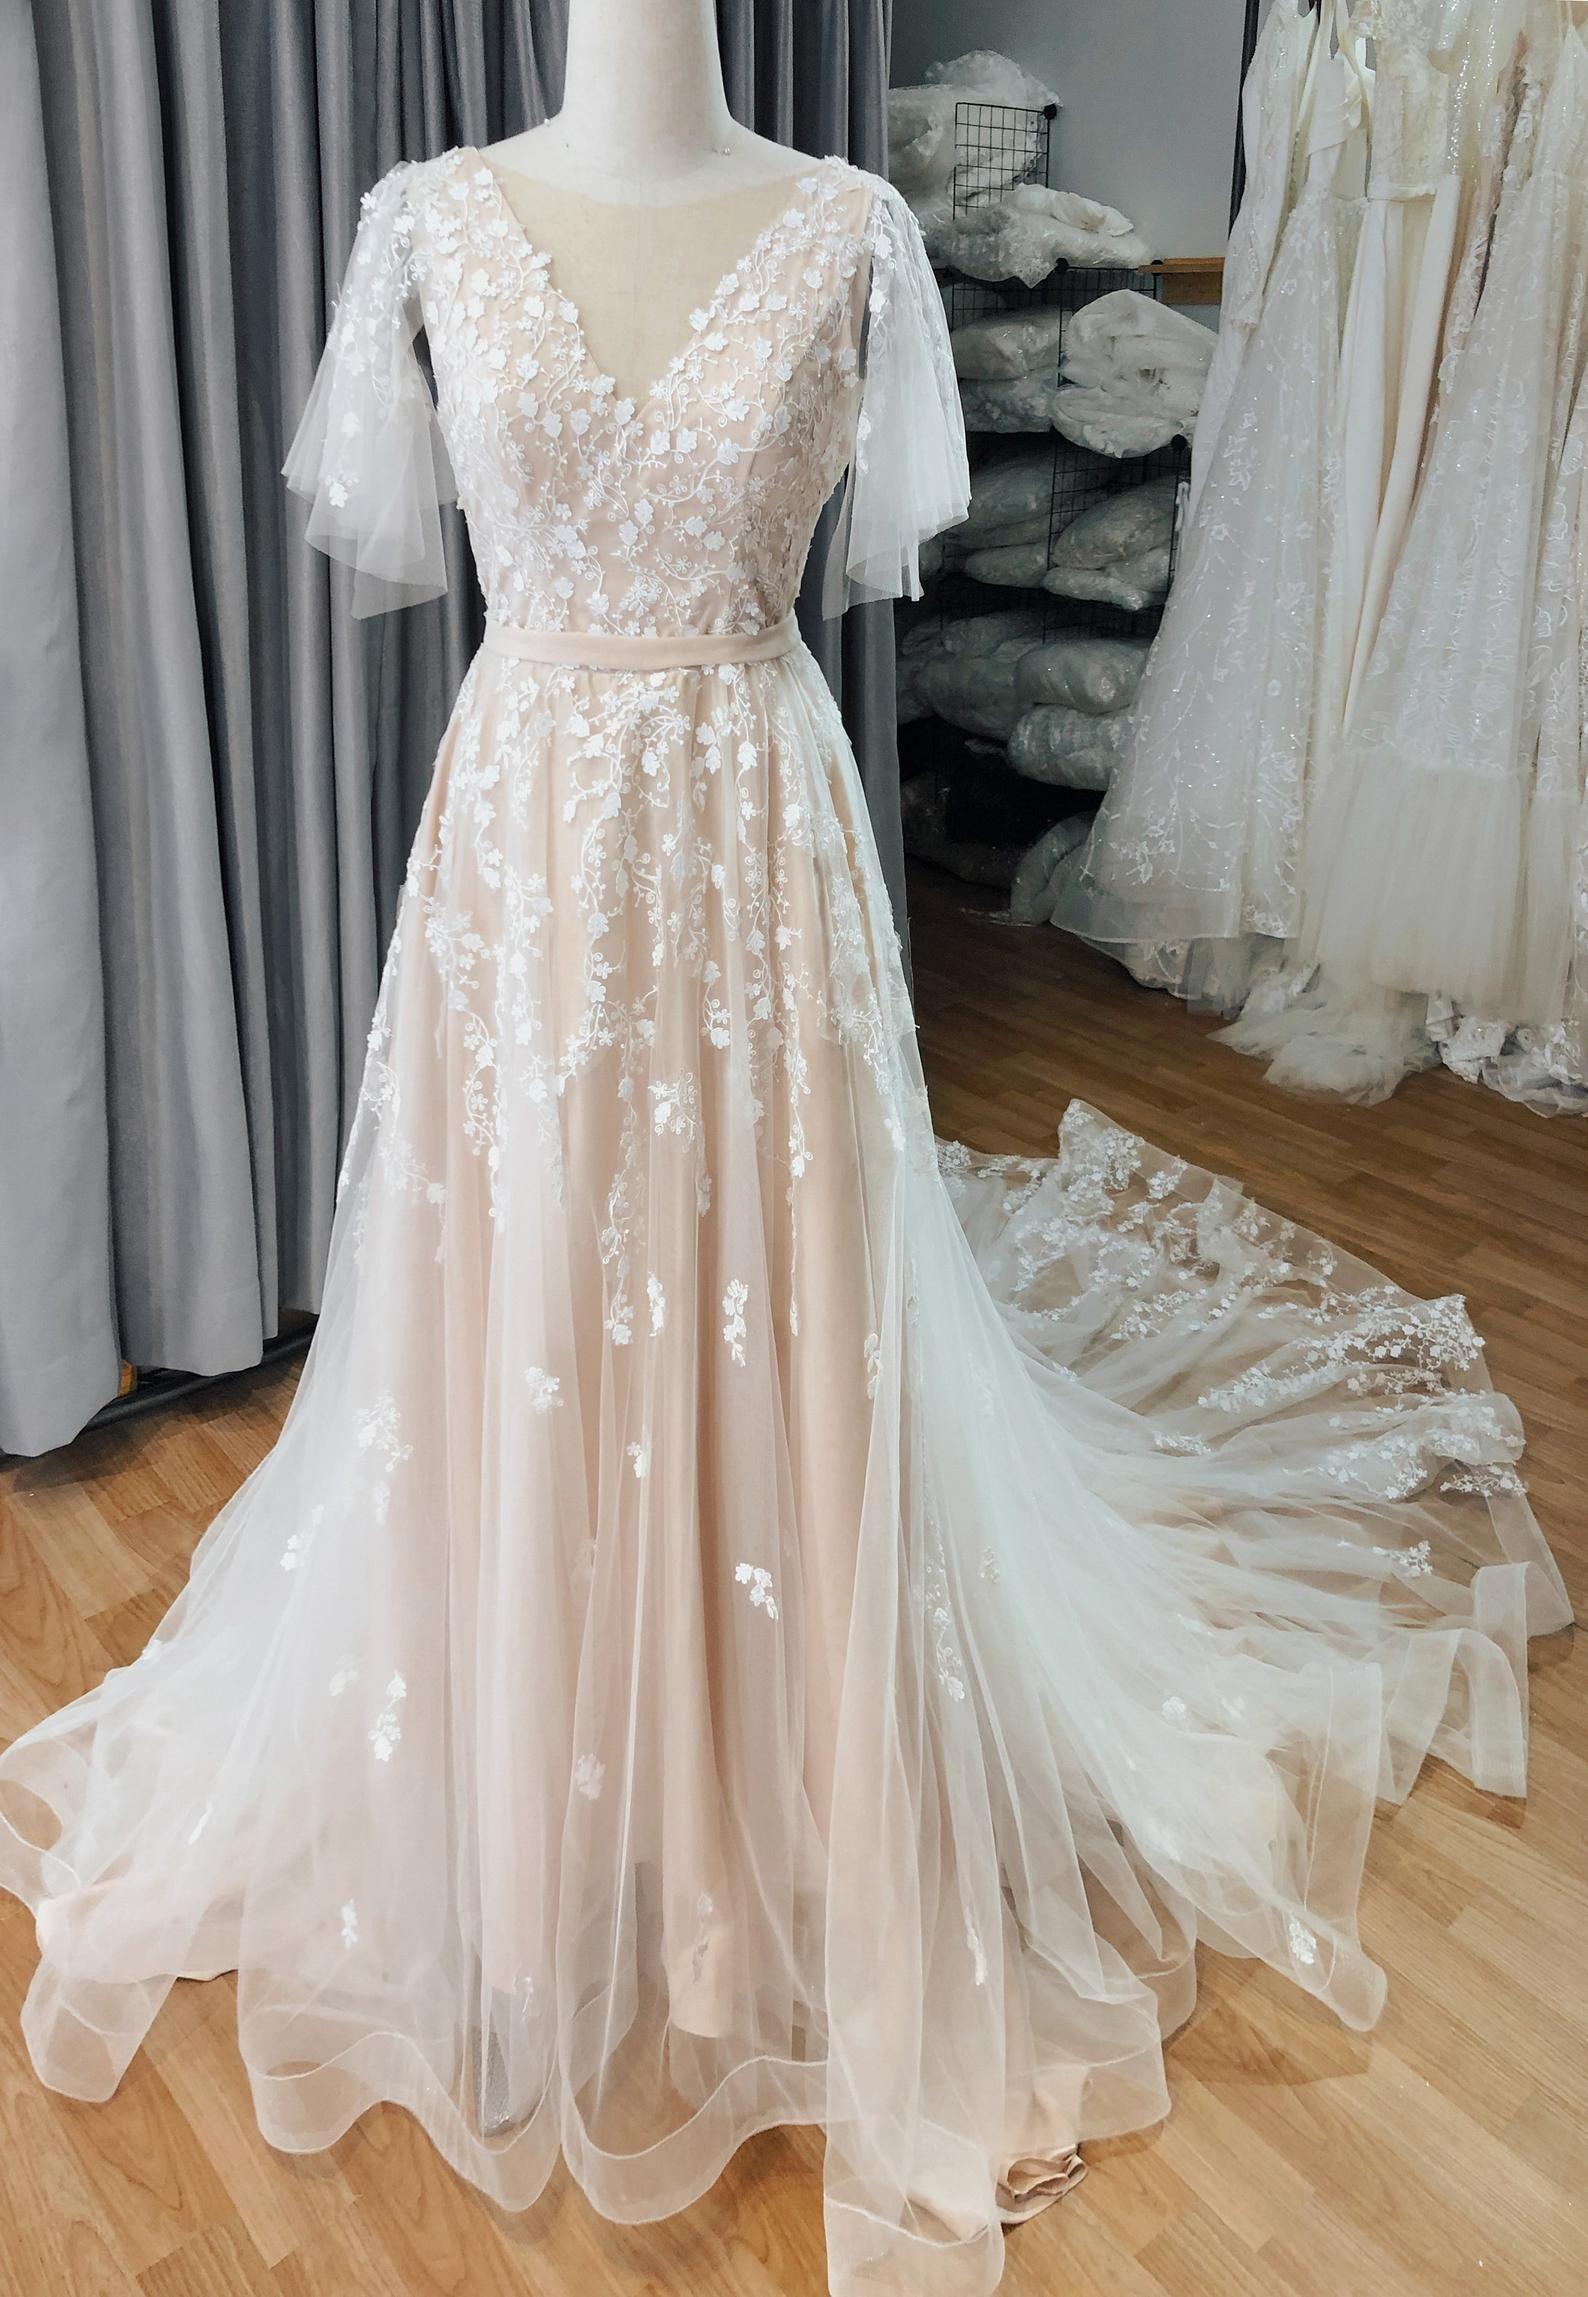 Sophia Vintage Blush Wedding Dress With Flutter Sleeve Open Etsy Blush Wedding Dress A Line Wedding Dress Blush Pink Wedding Dress [ 2297 x 1588 Pixel ]